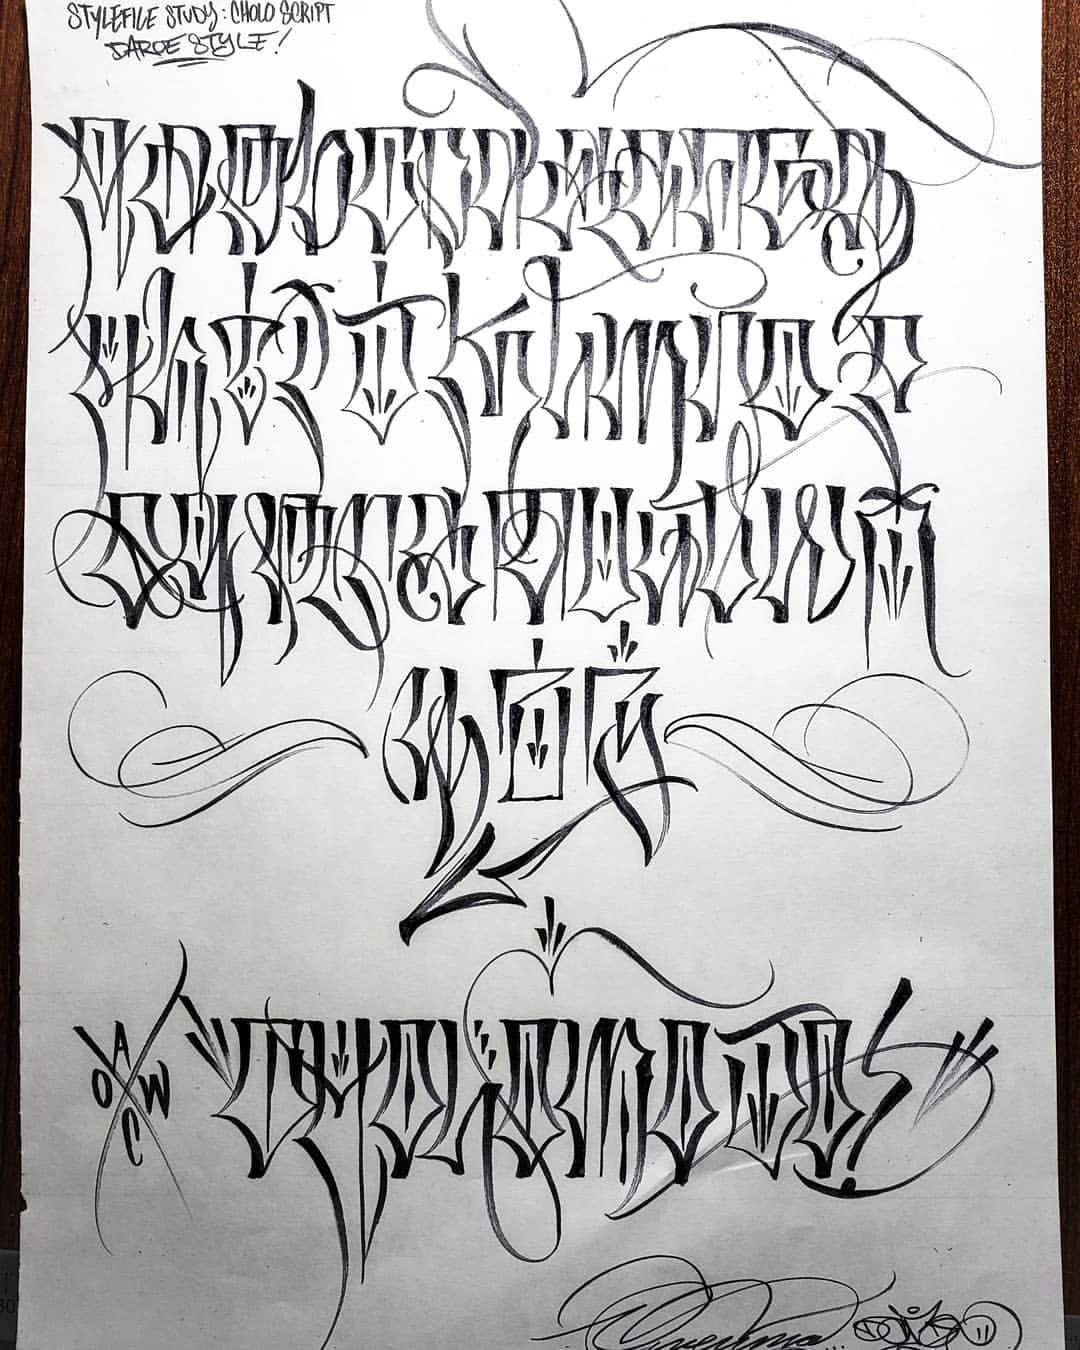 622 Likes 7 Comments Owenuma Daroe7 Aow Owenuma On Instagram Daroe7 Style Chol In 2020 Tattoo Lettering Alphabet Tattoo Fonts Alphabet Tattoo Lettering Design